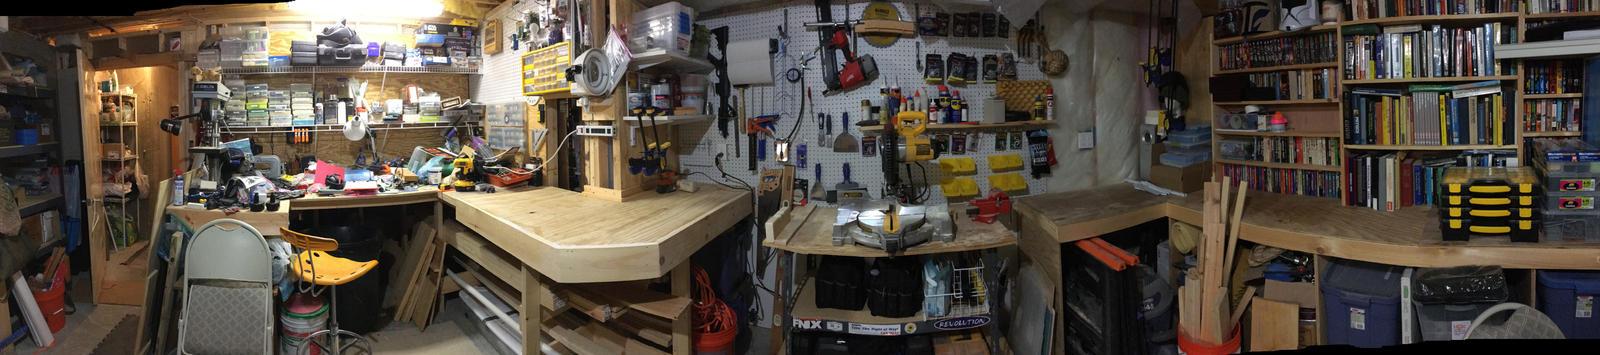 workshop pano